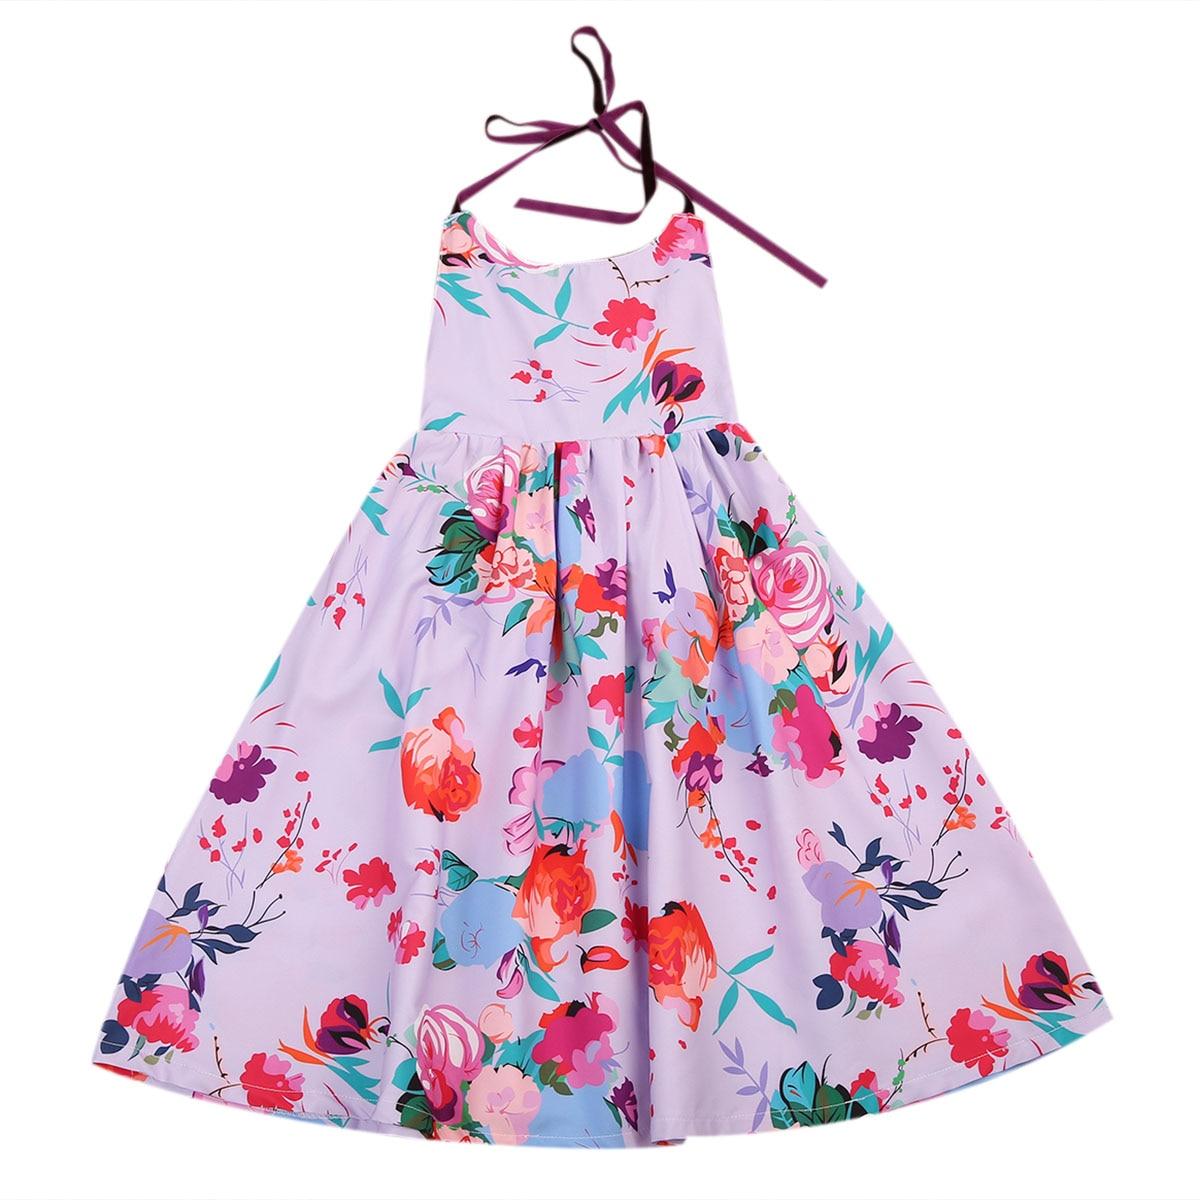 Girls Floral Print Sleeveless Halter Dress Clothes Kids